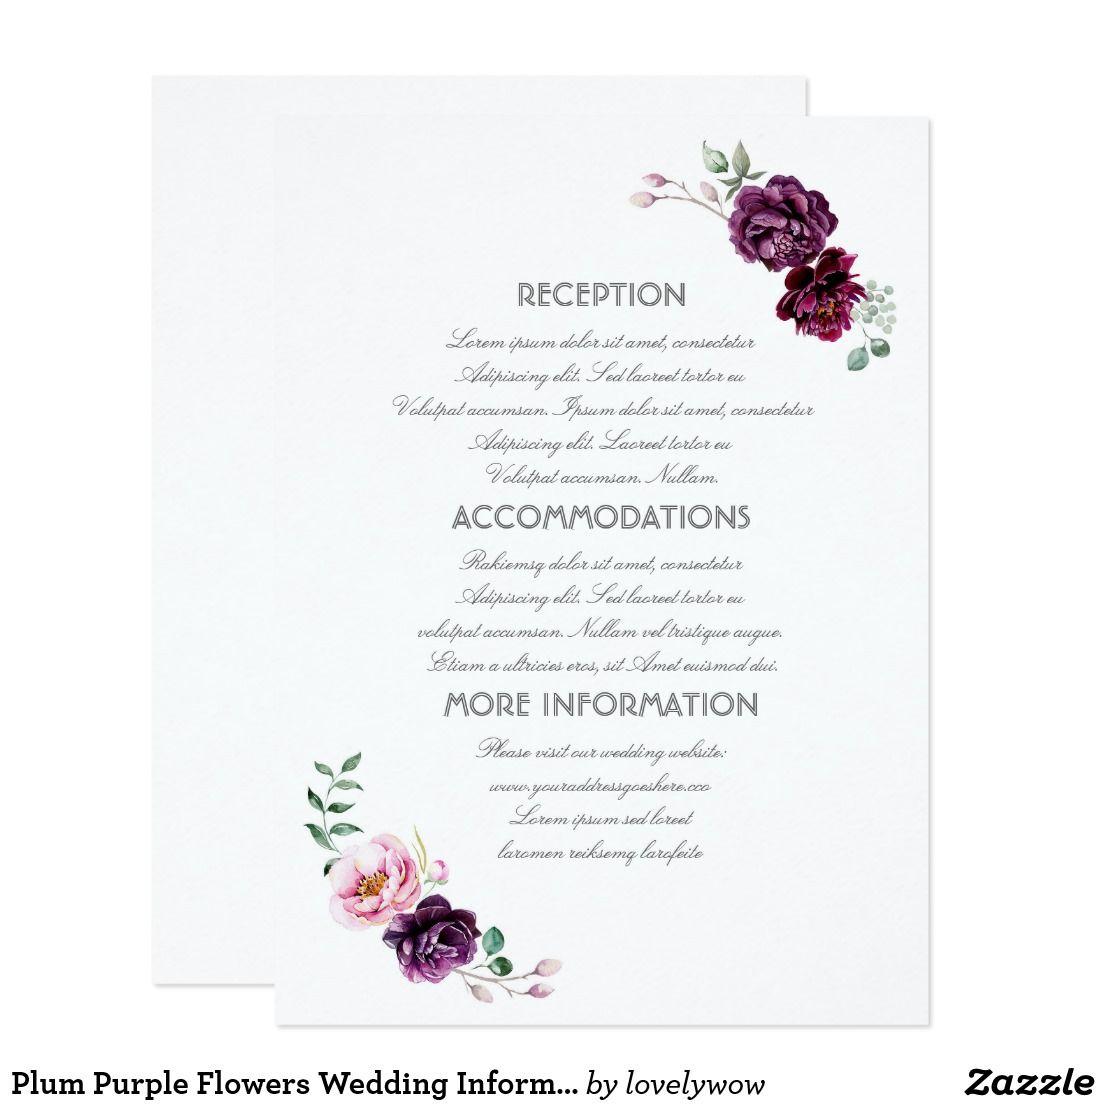 Purple Wedding Ideas With Pretty Details: Plum Purple Flowers Wedding Information Guest Card